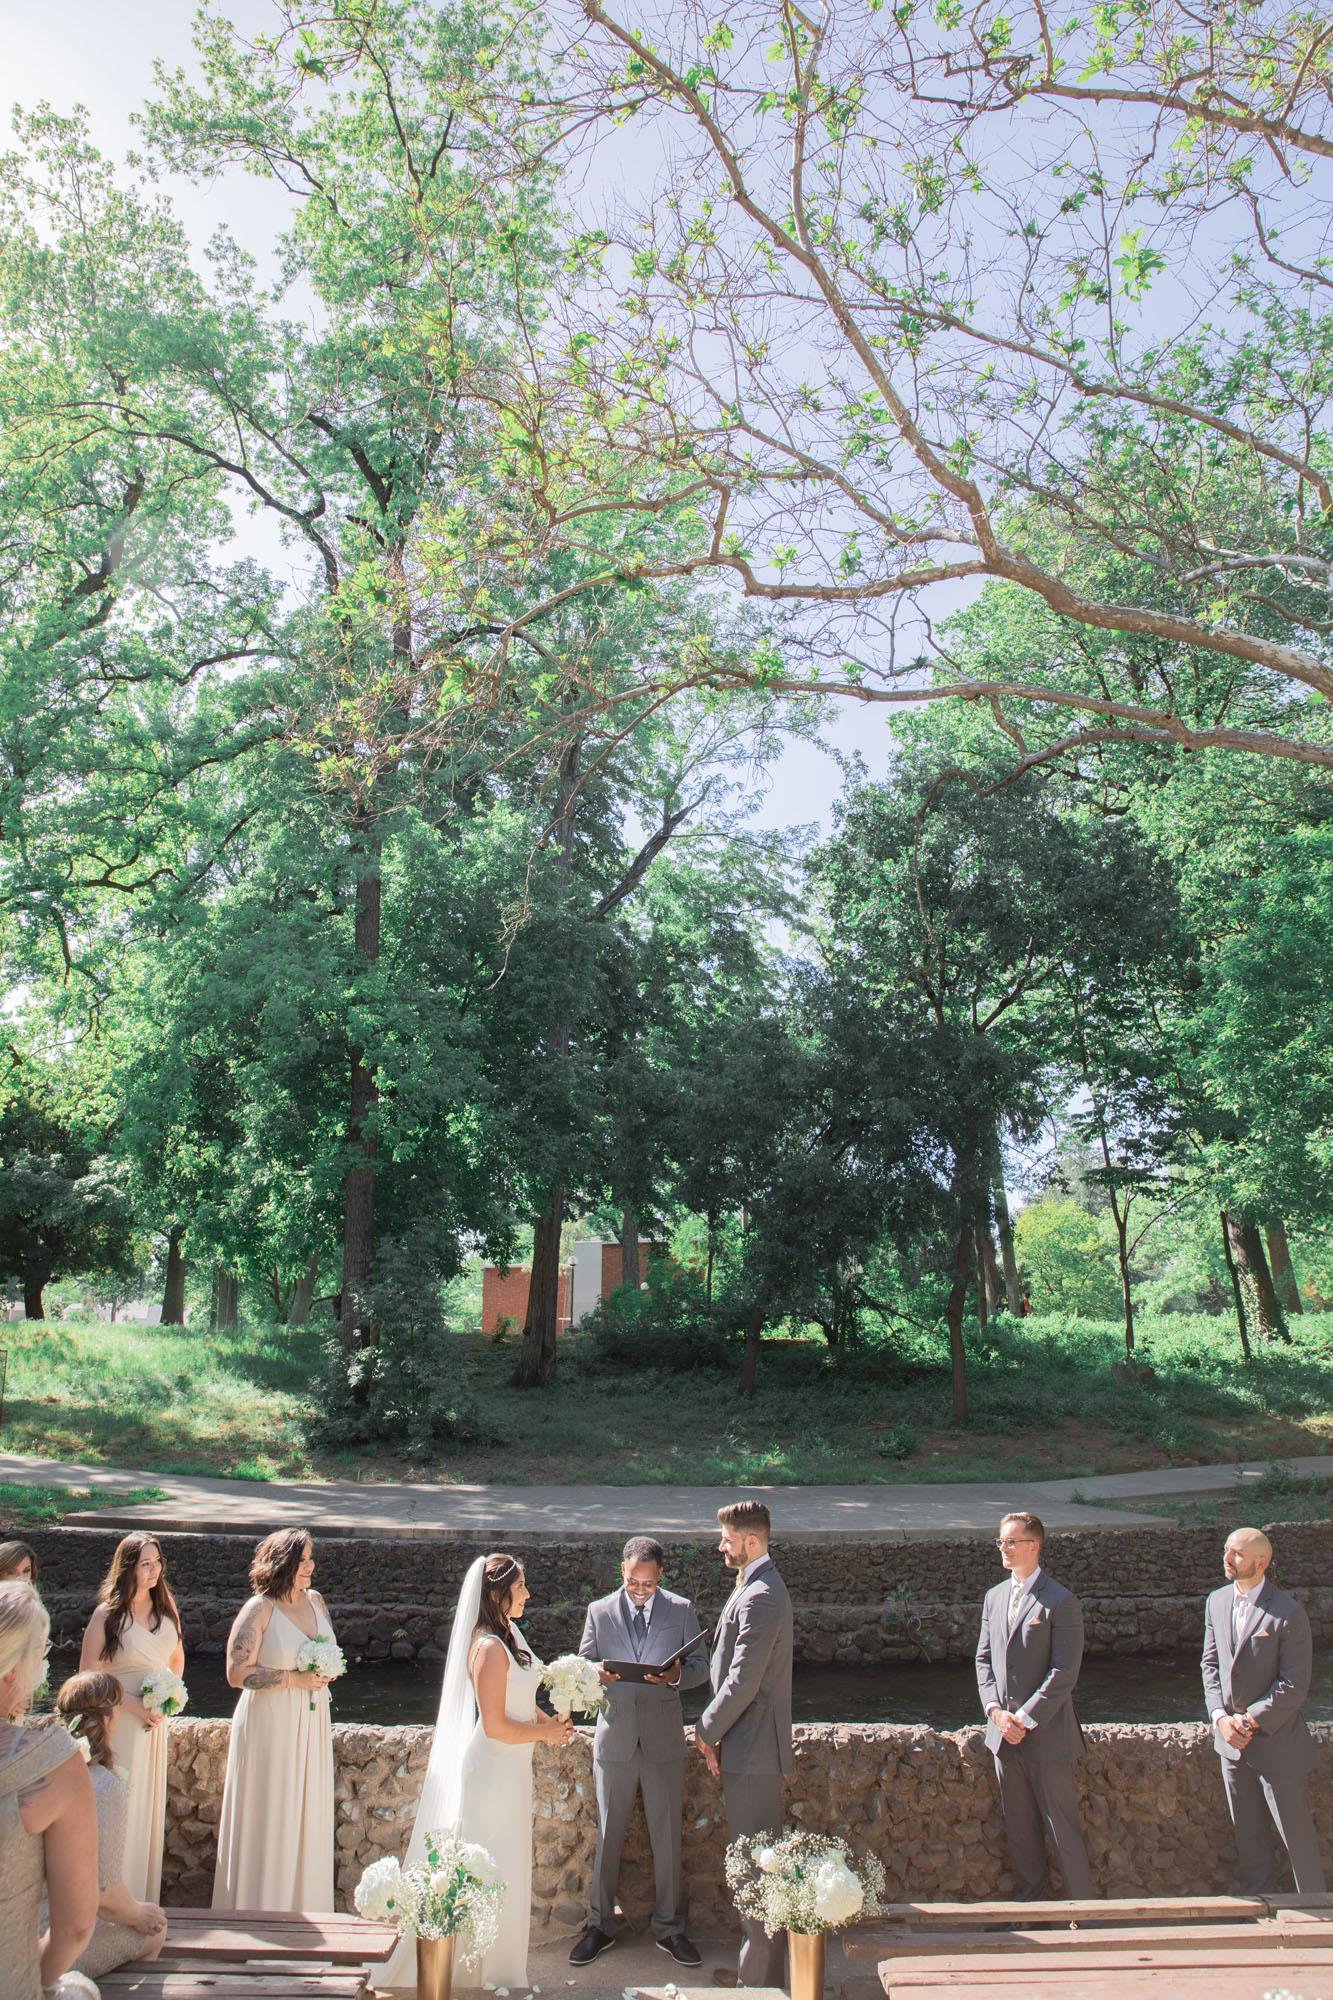 Chico Amphitheater wedding 03.jpg